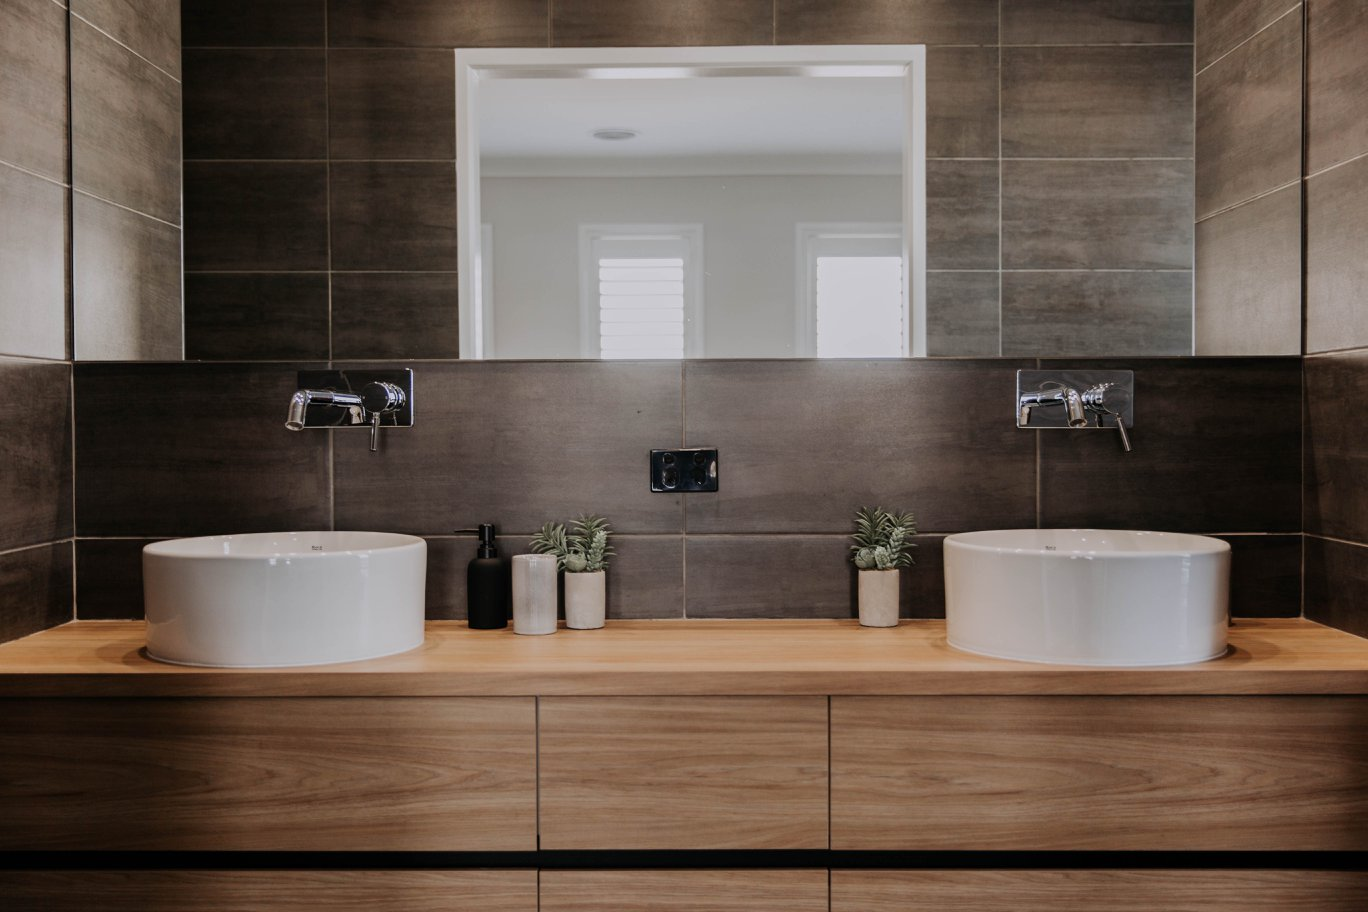 008 Alatalo Bros - new homes - display home - ensuite - bathroom design - timber grain - vanity - cabinet design - custom cabinets - bathroom cabinet design - interior design - his and hers - double vanity - master bathroom